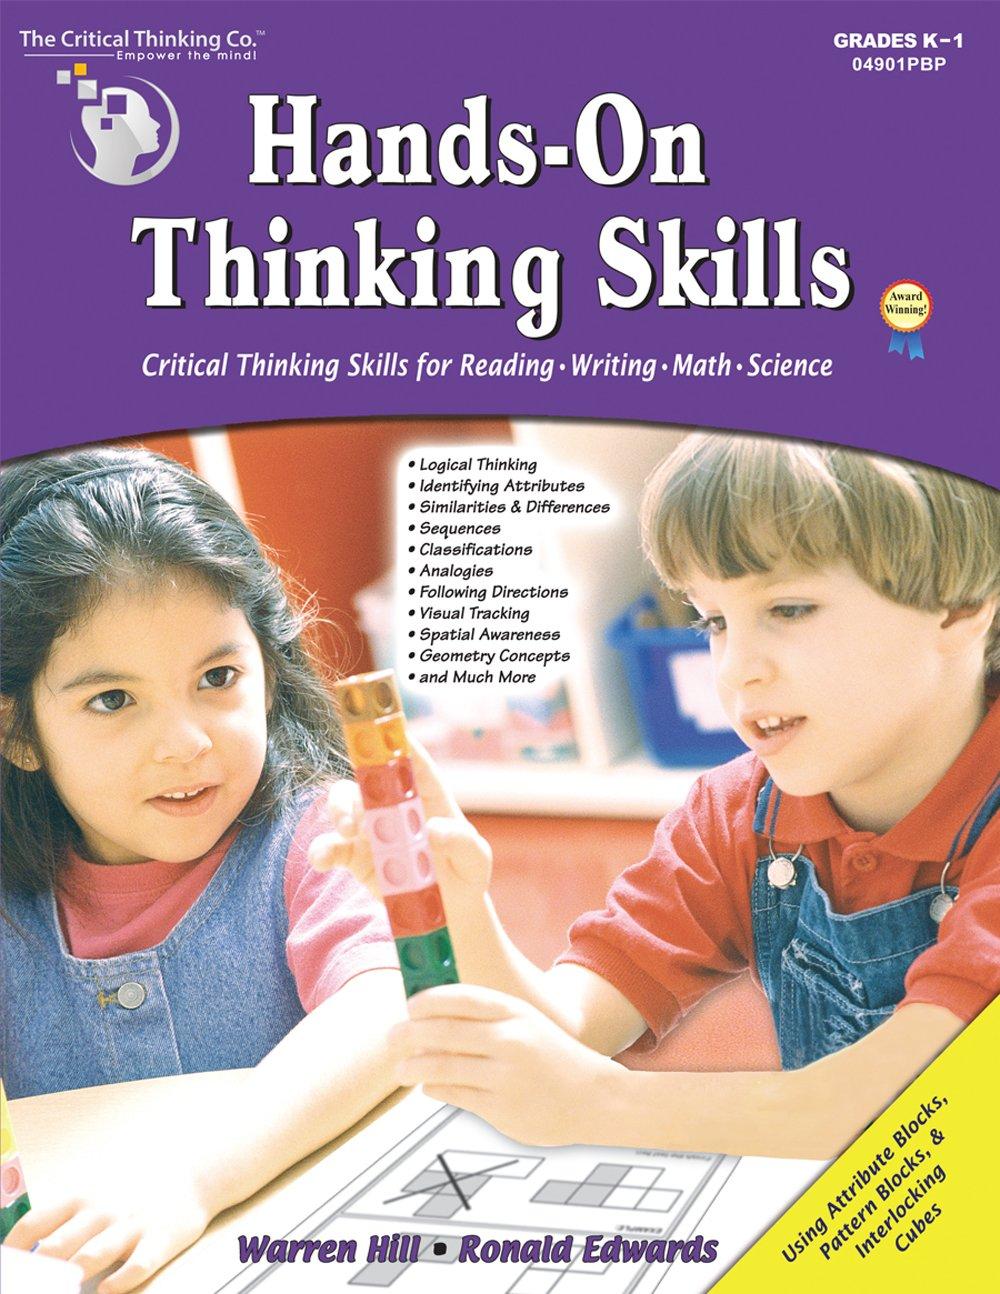 Hands-On Thinking Skills